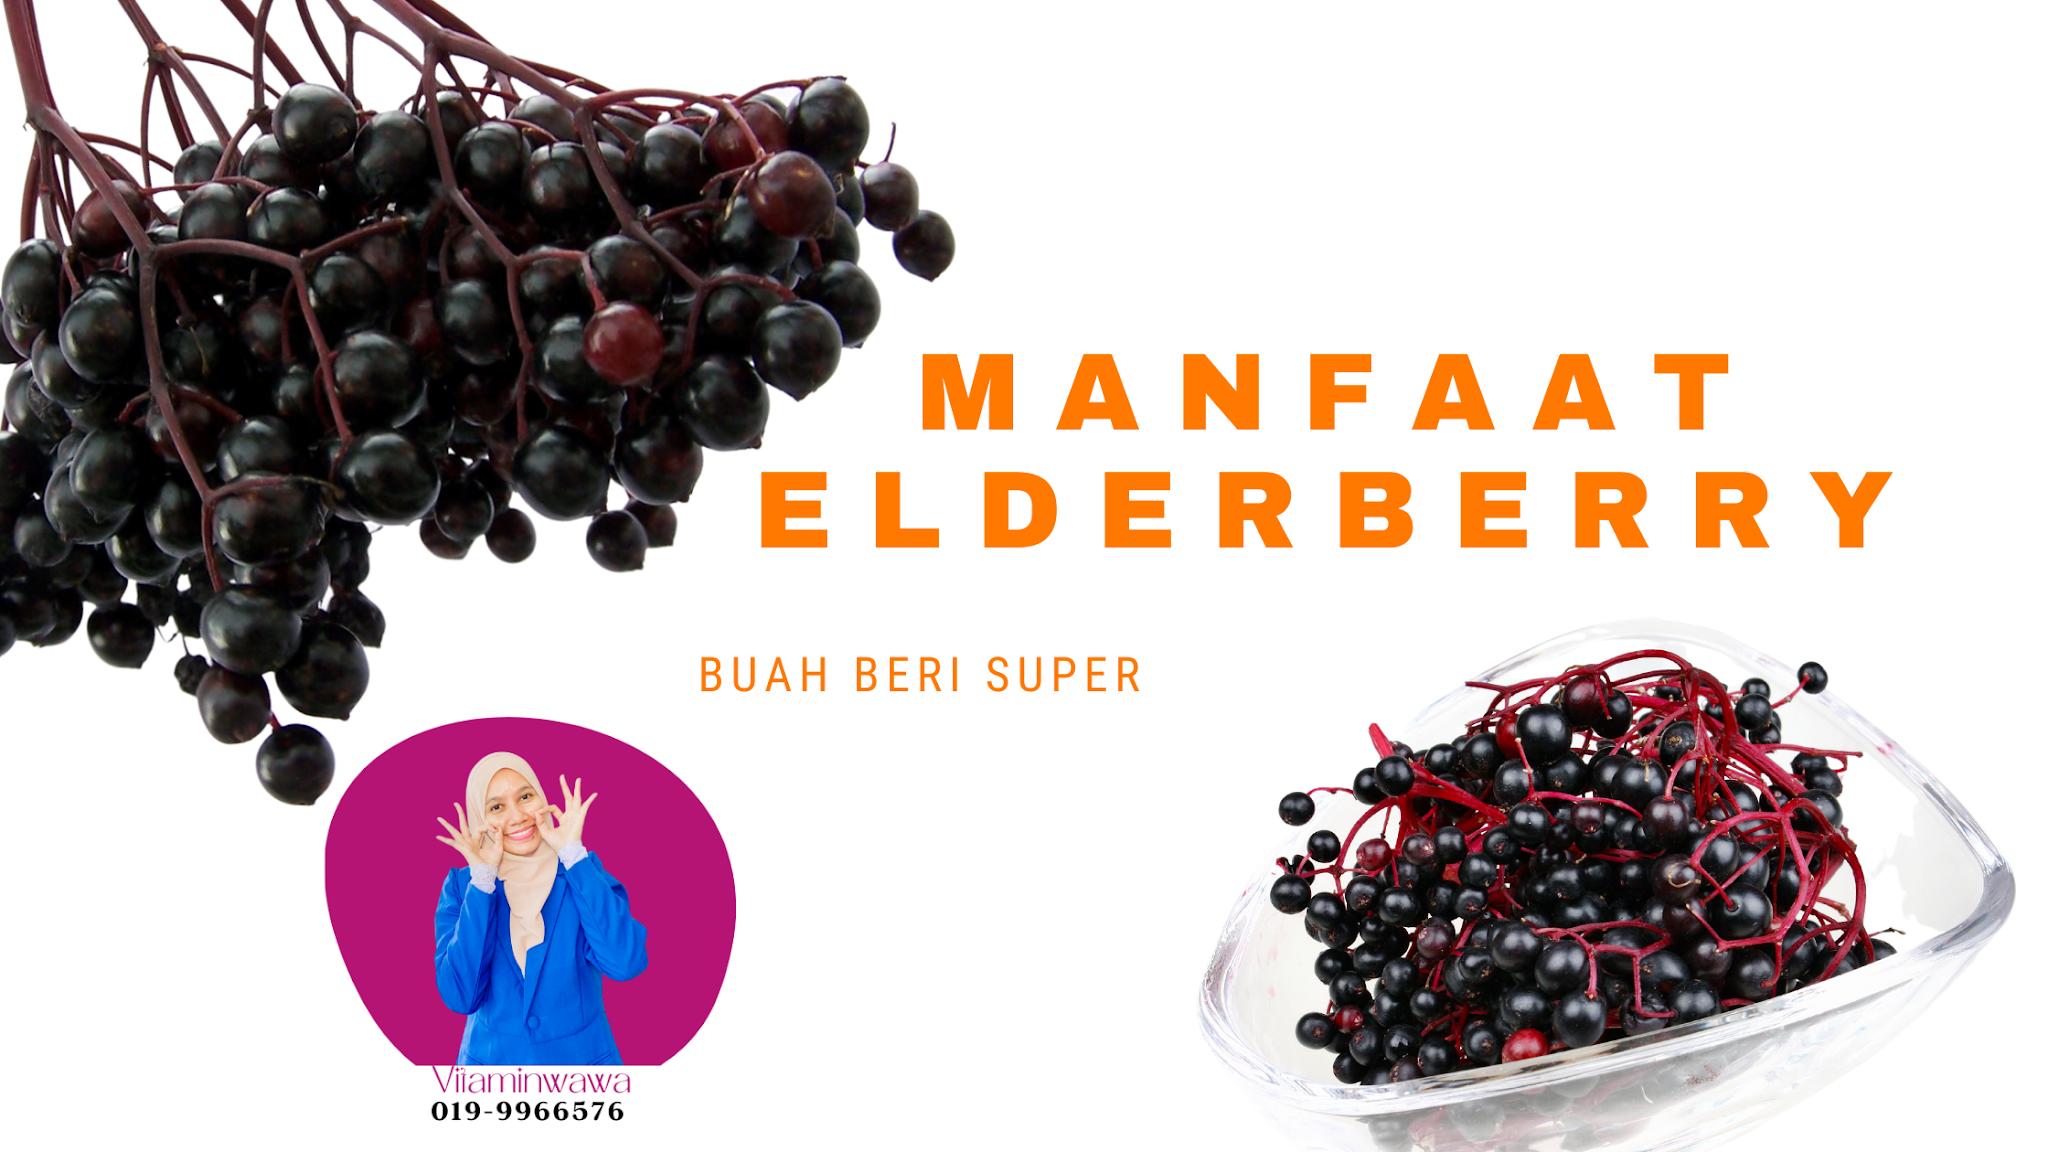 Life Shake Elderberry Shaklee , Manfaat elderberry